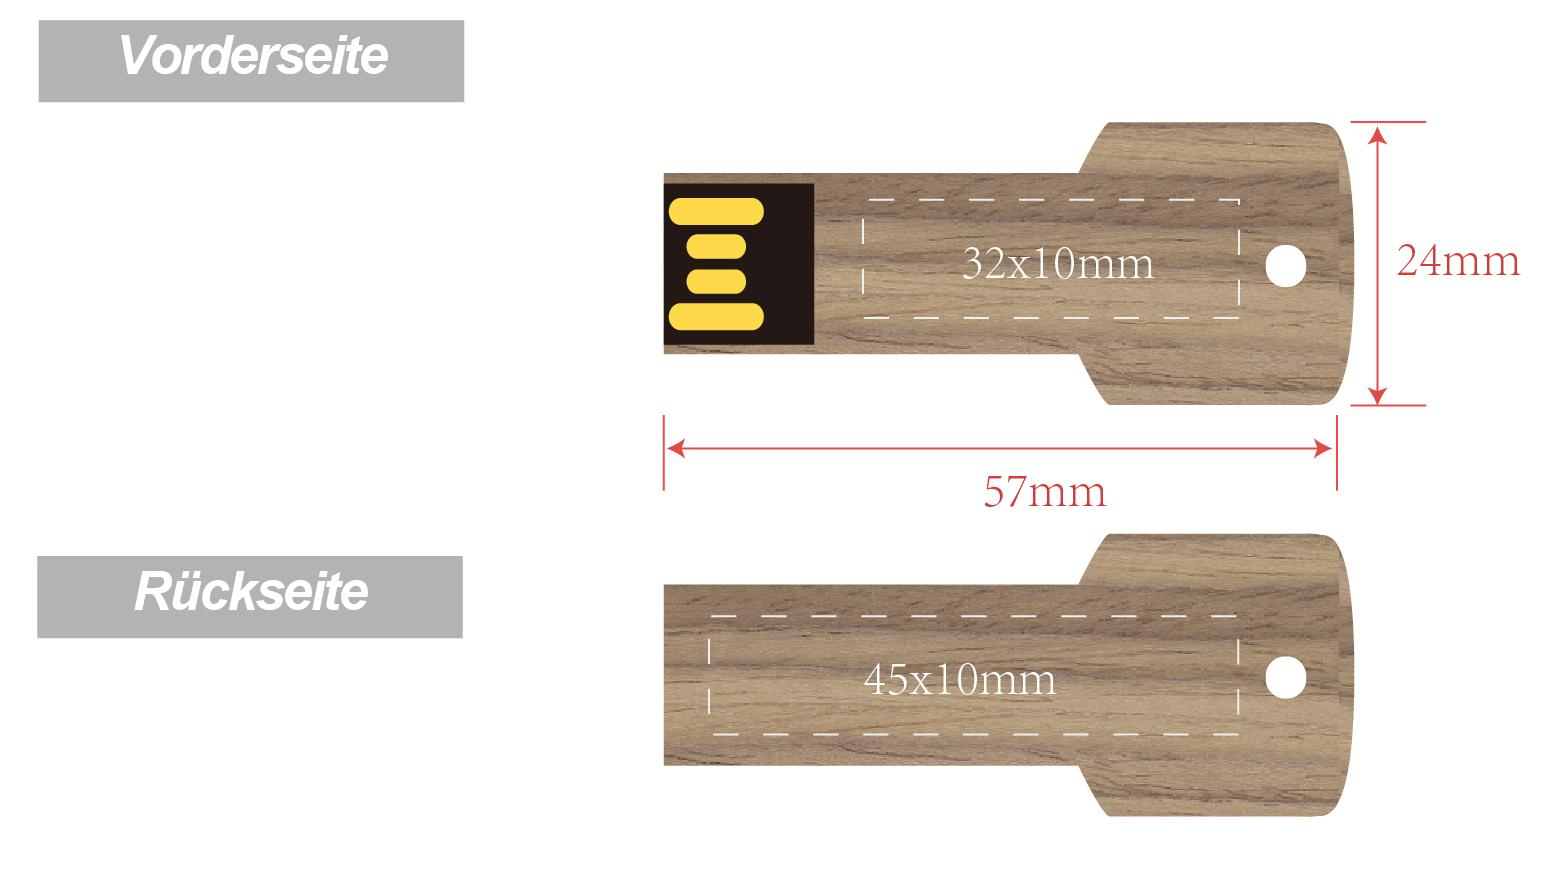 Wood-Key-Holz-USB-Sticks-Schlussel-Ansicht